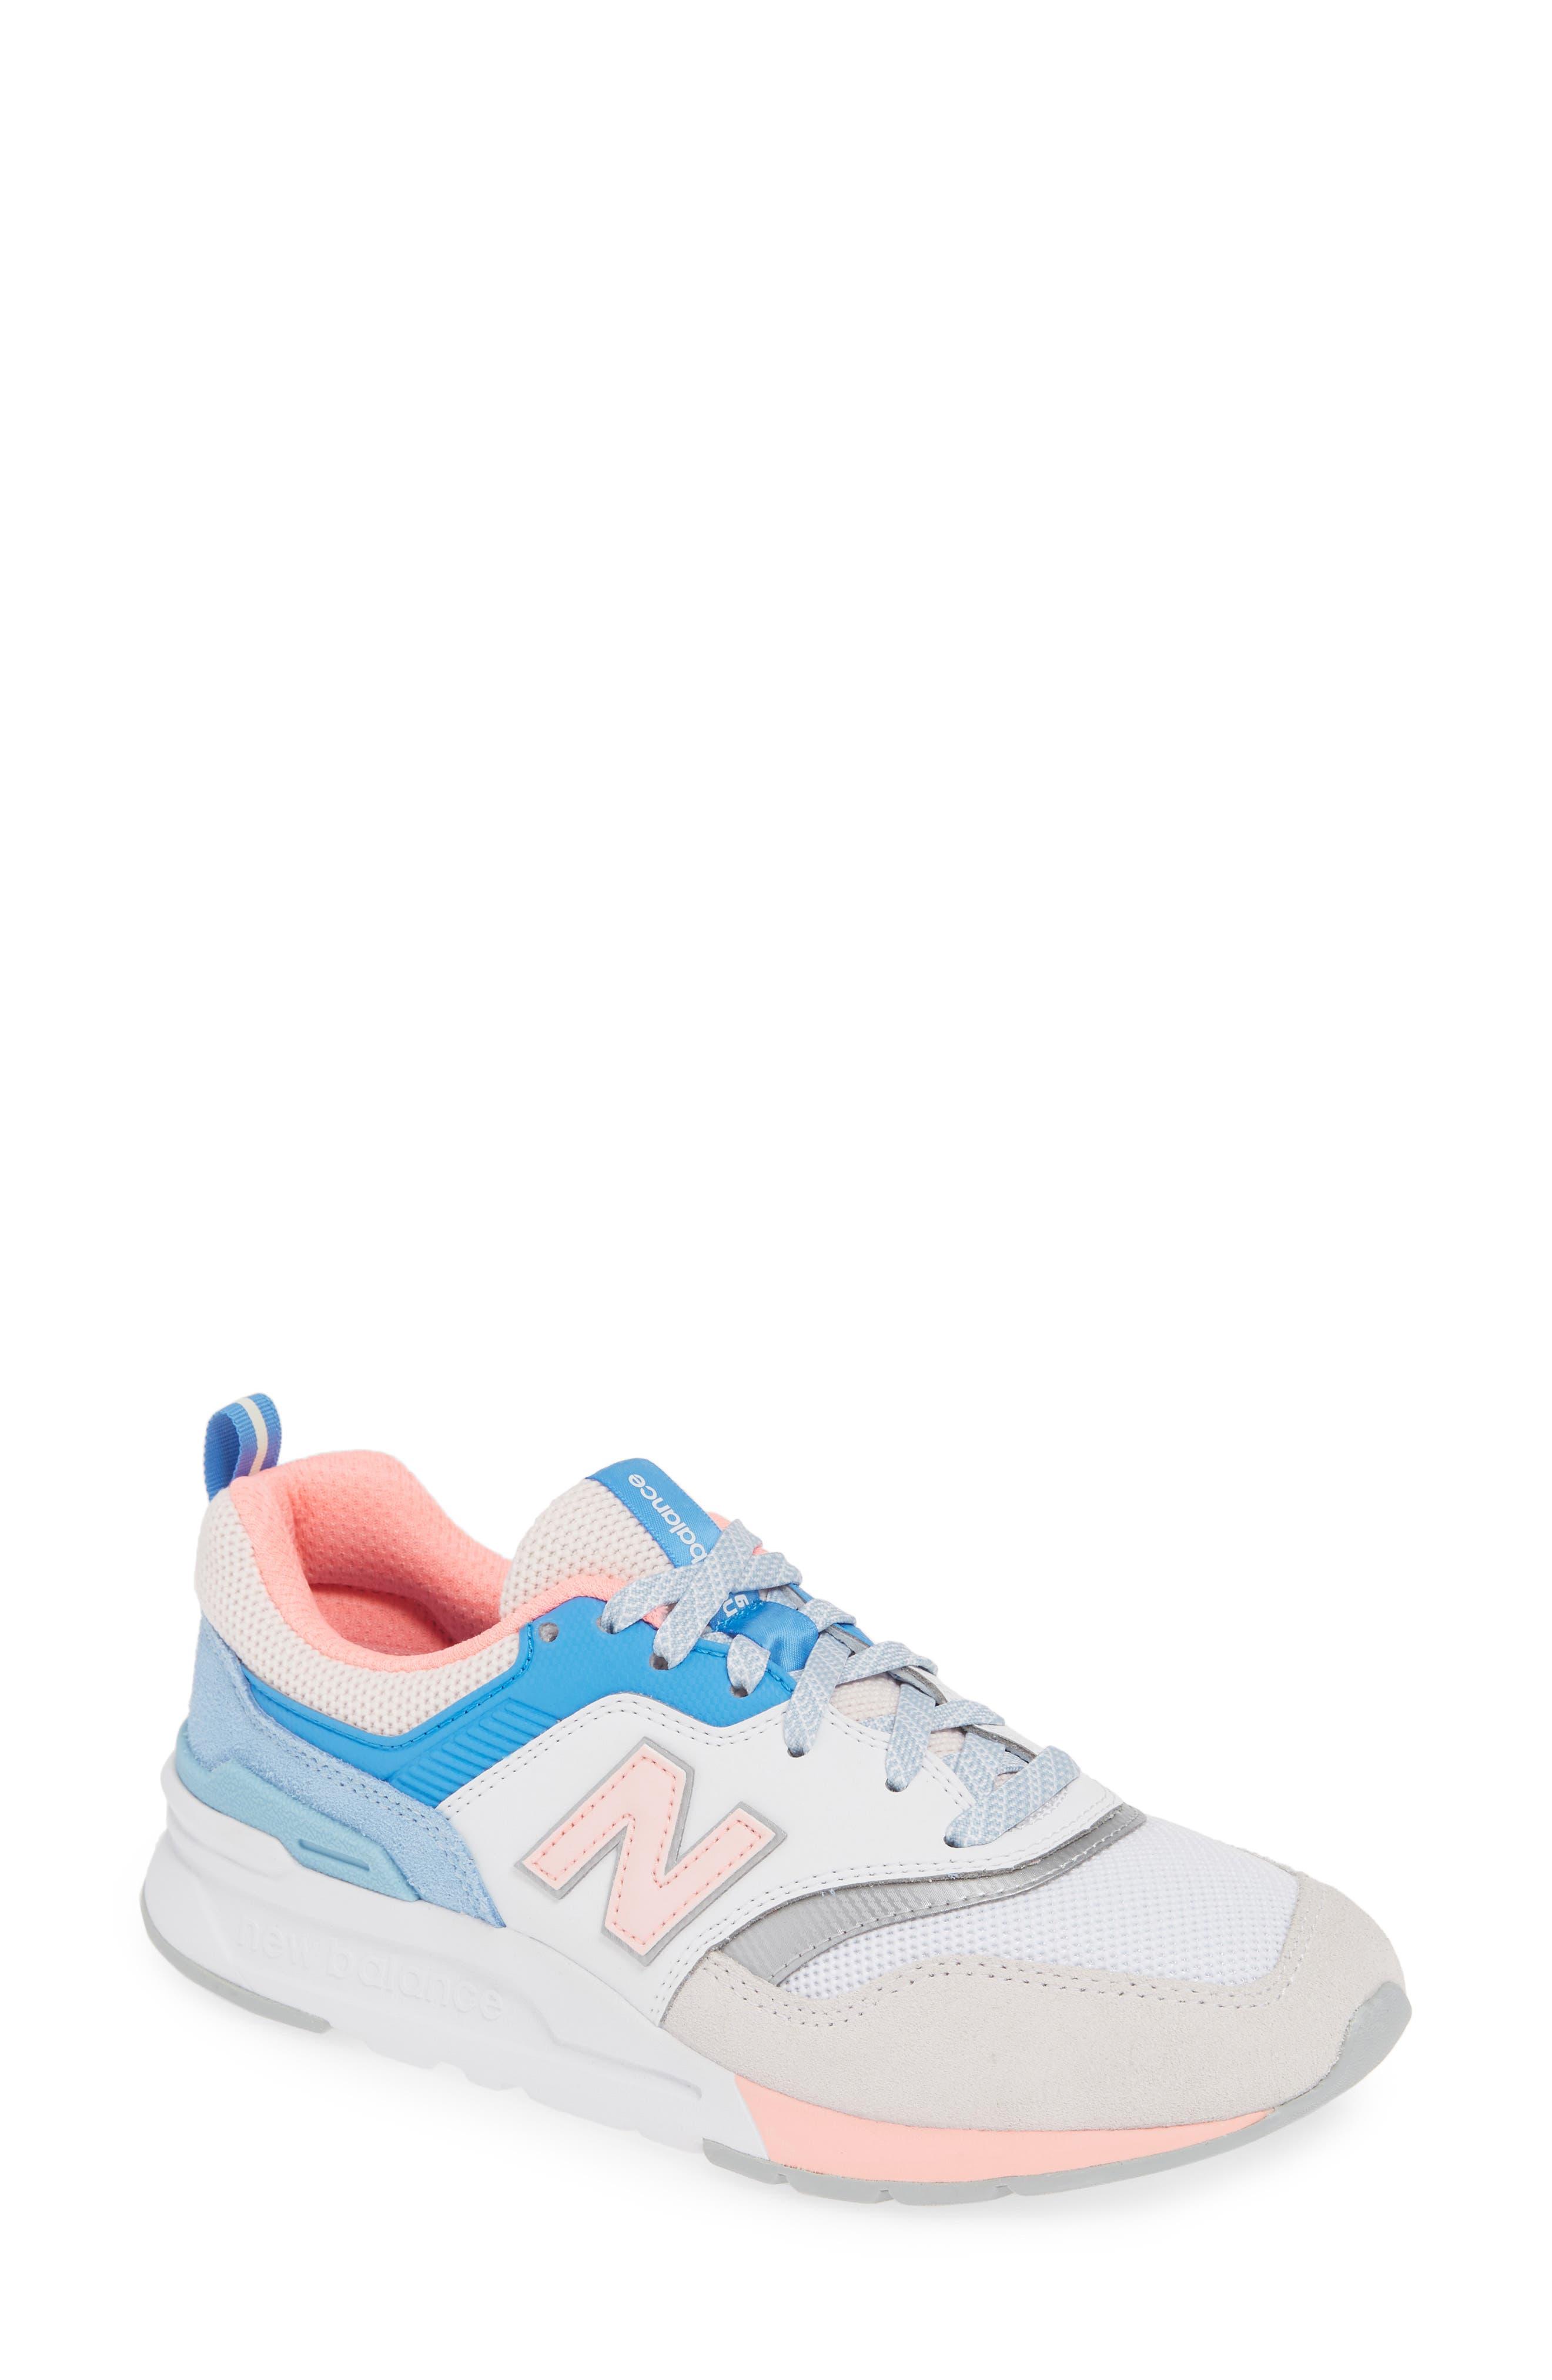 New Balance 997H Sneaker B - Blue